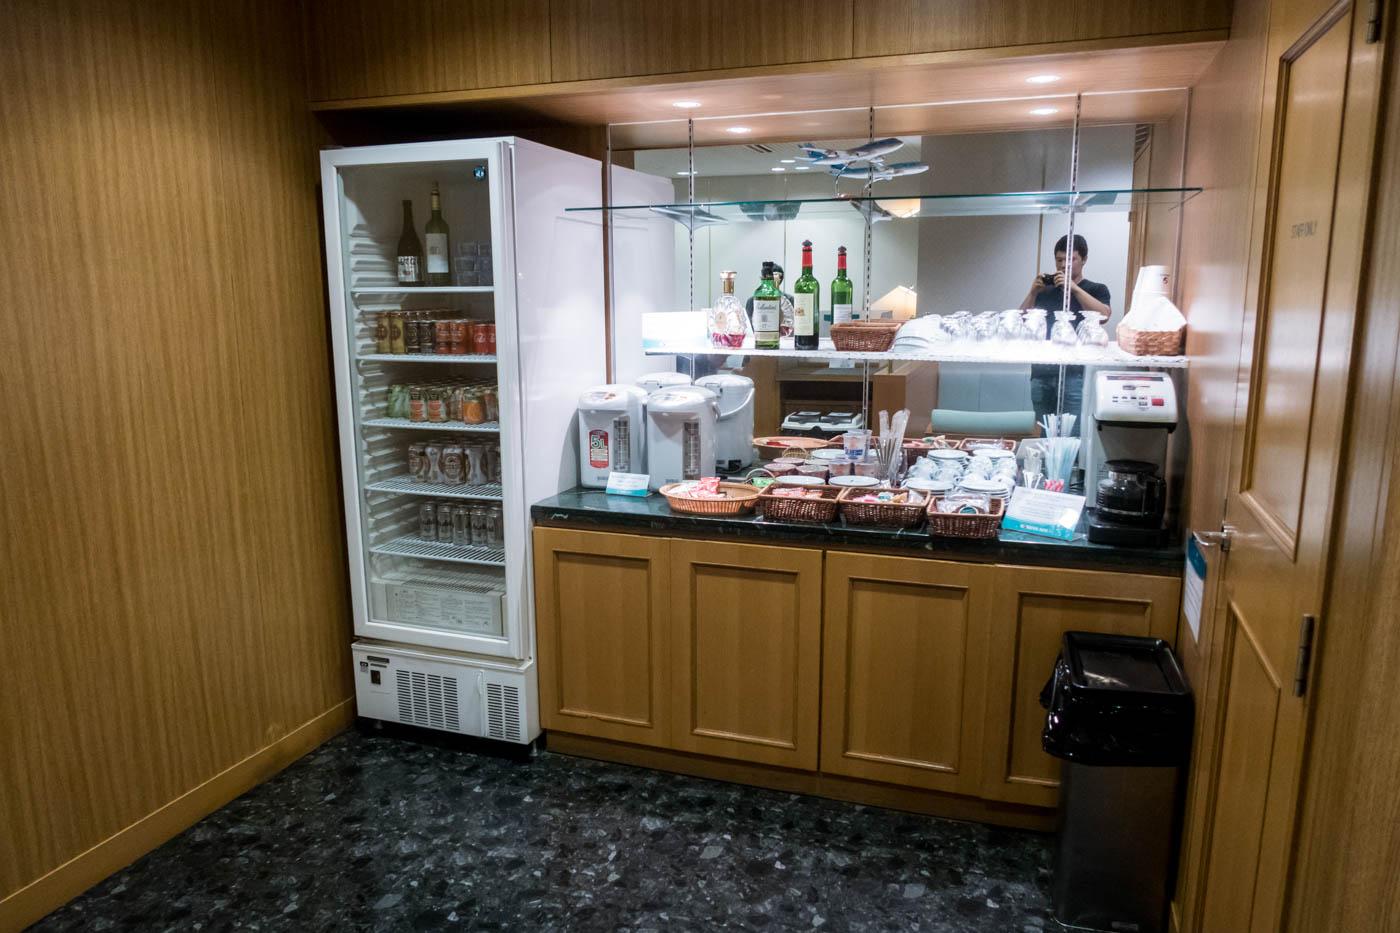 KAL Lounge Fukuoka Drinks and Food